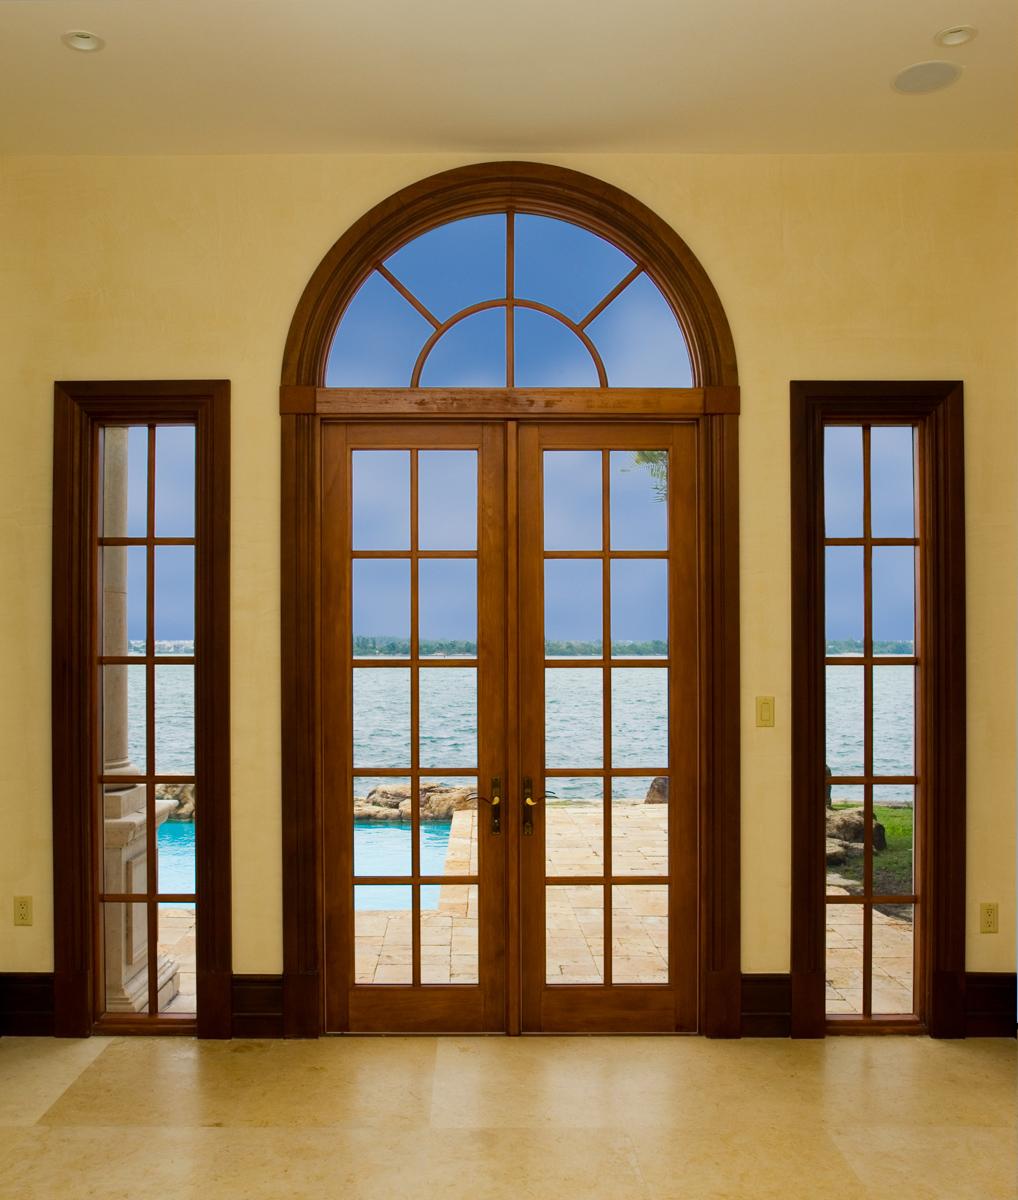 Modern Exterior Used Aluminum Window Grill Design Interior ... on Exterior Grill Design id=98817